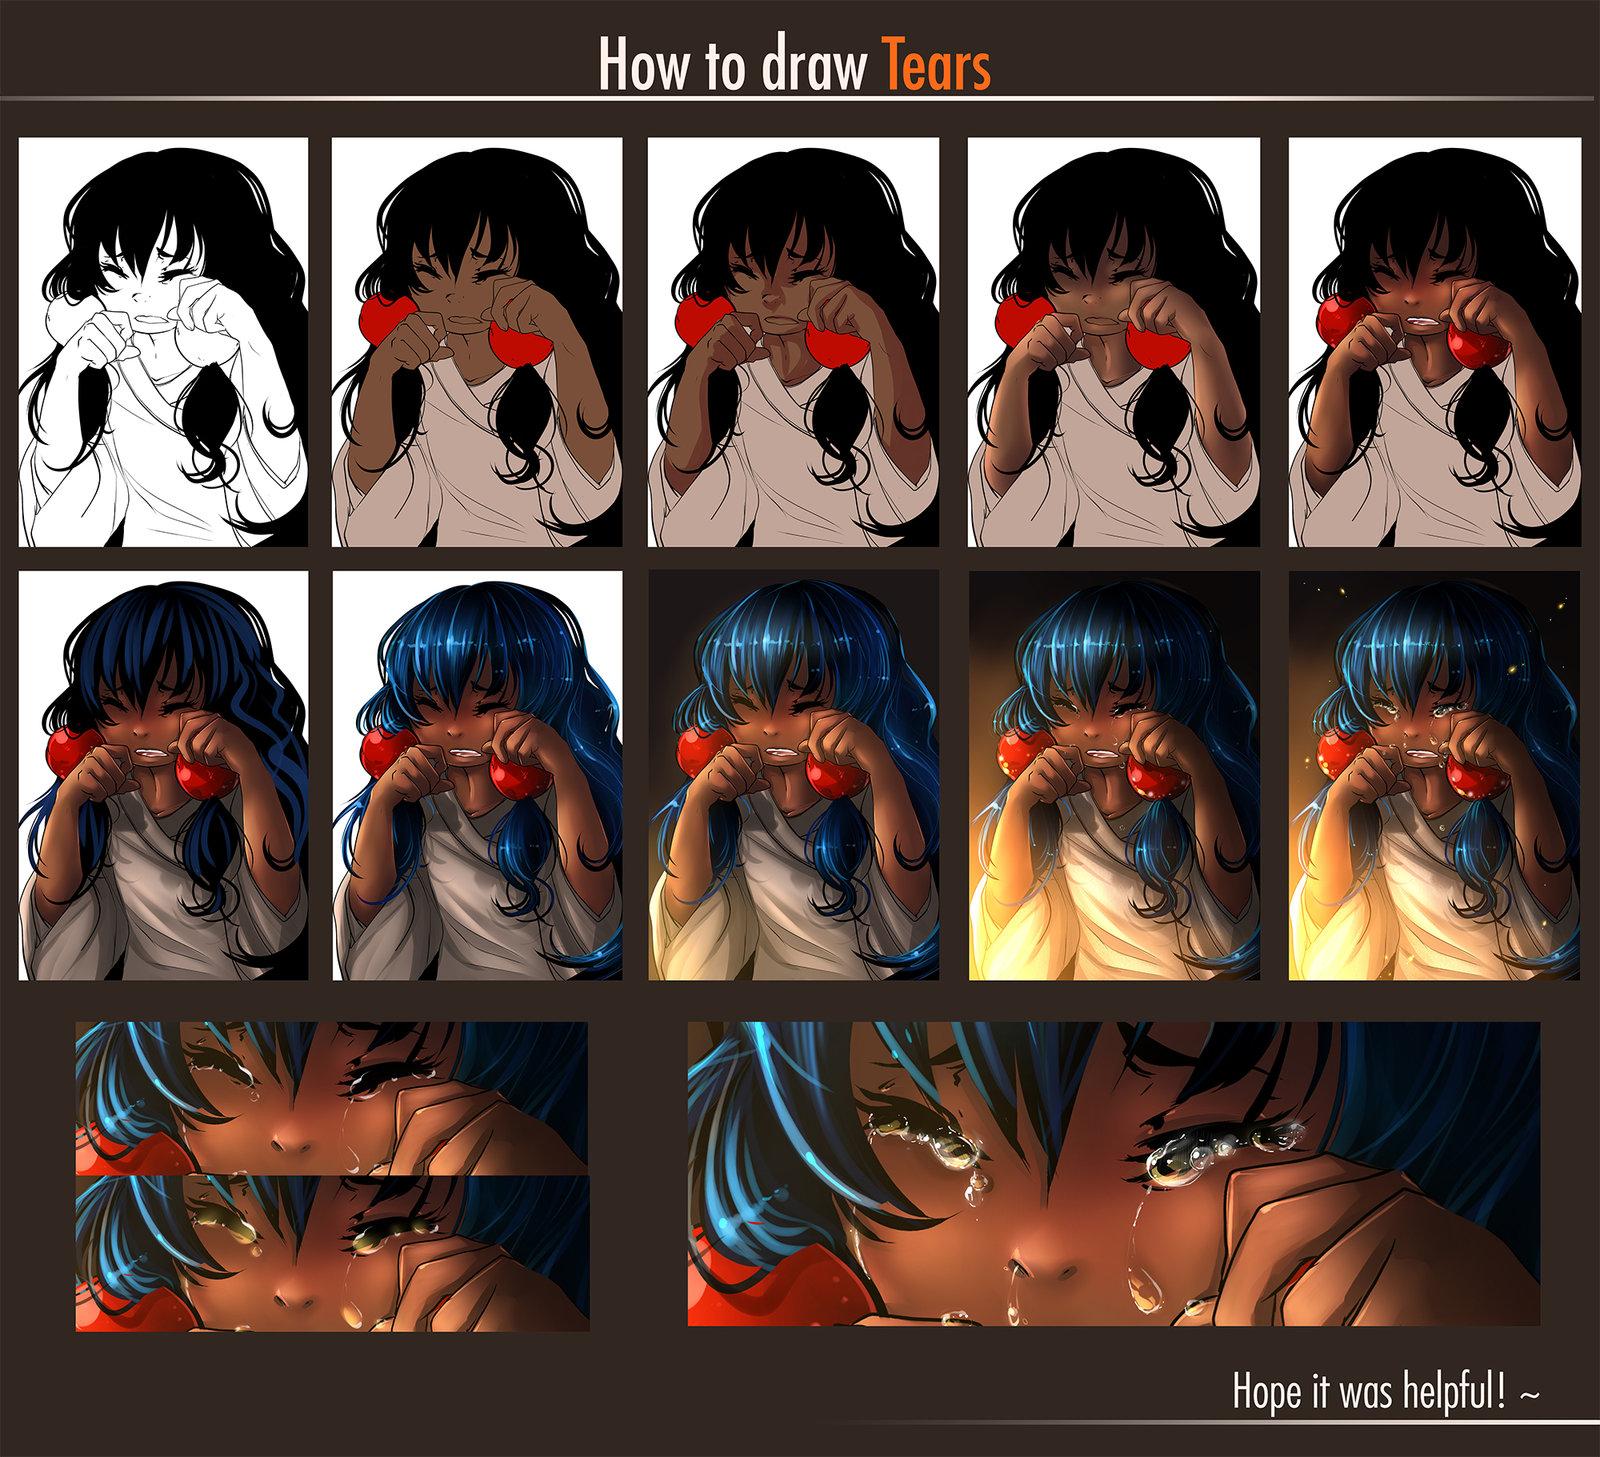 Drawn tears detail drawing Draw Yokufo  Tears To